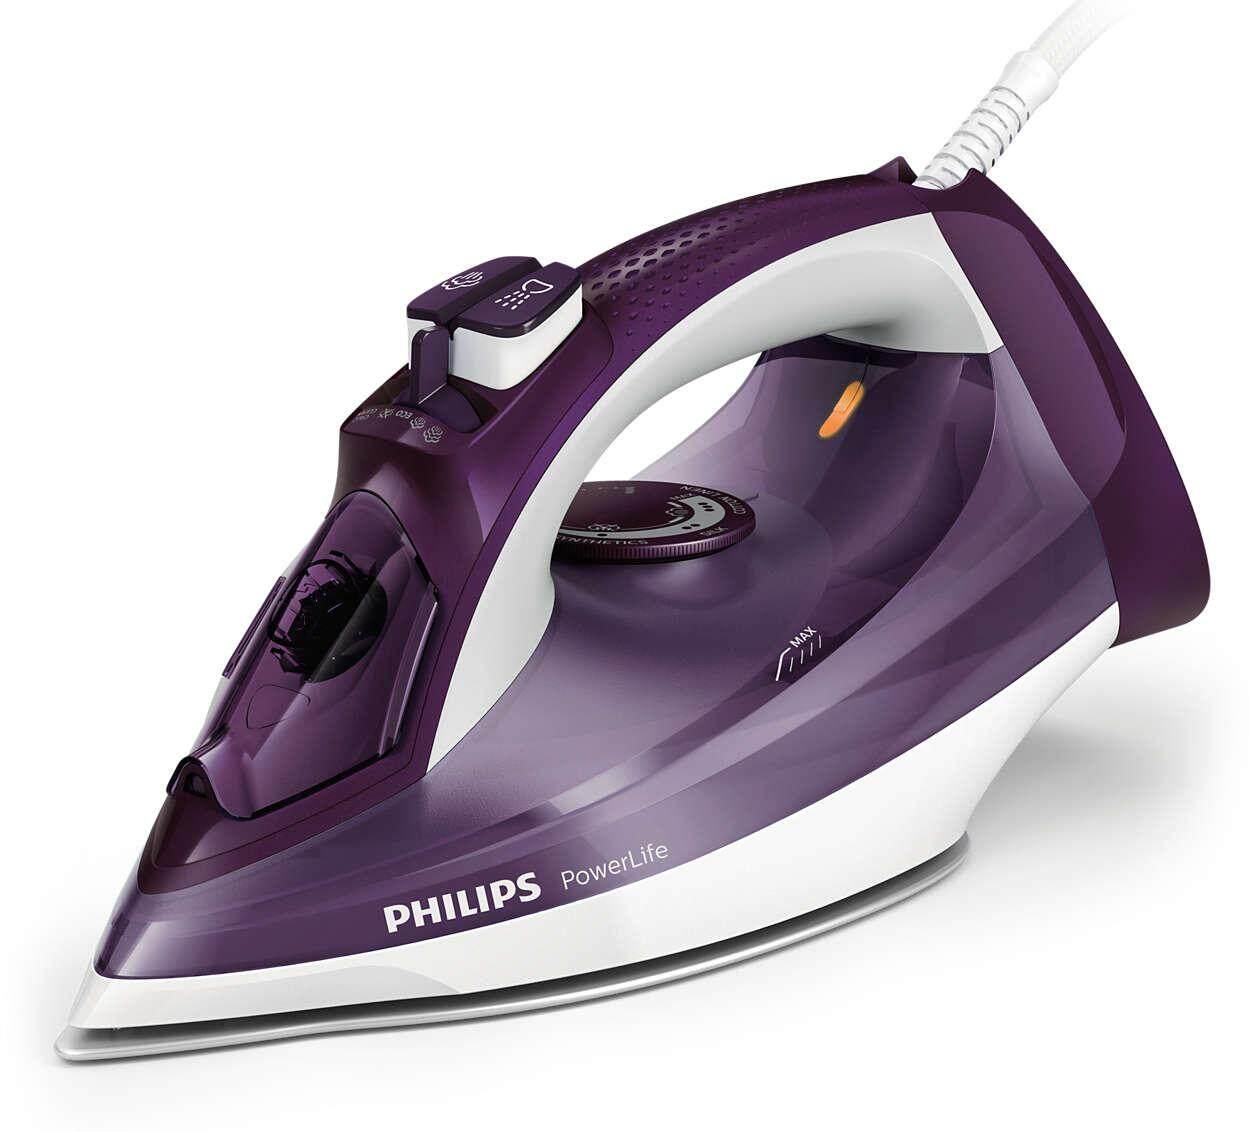 Philips PowerLife เตารีดไอน้ำ GC2995/30 Free Shipping